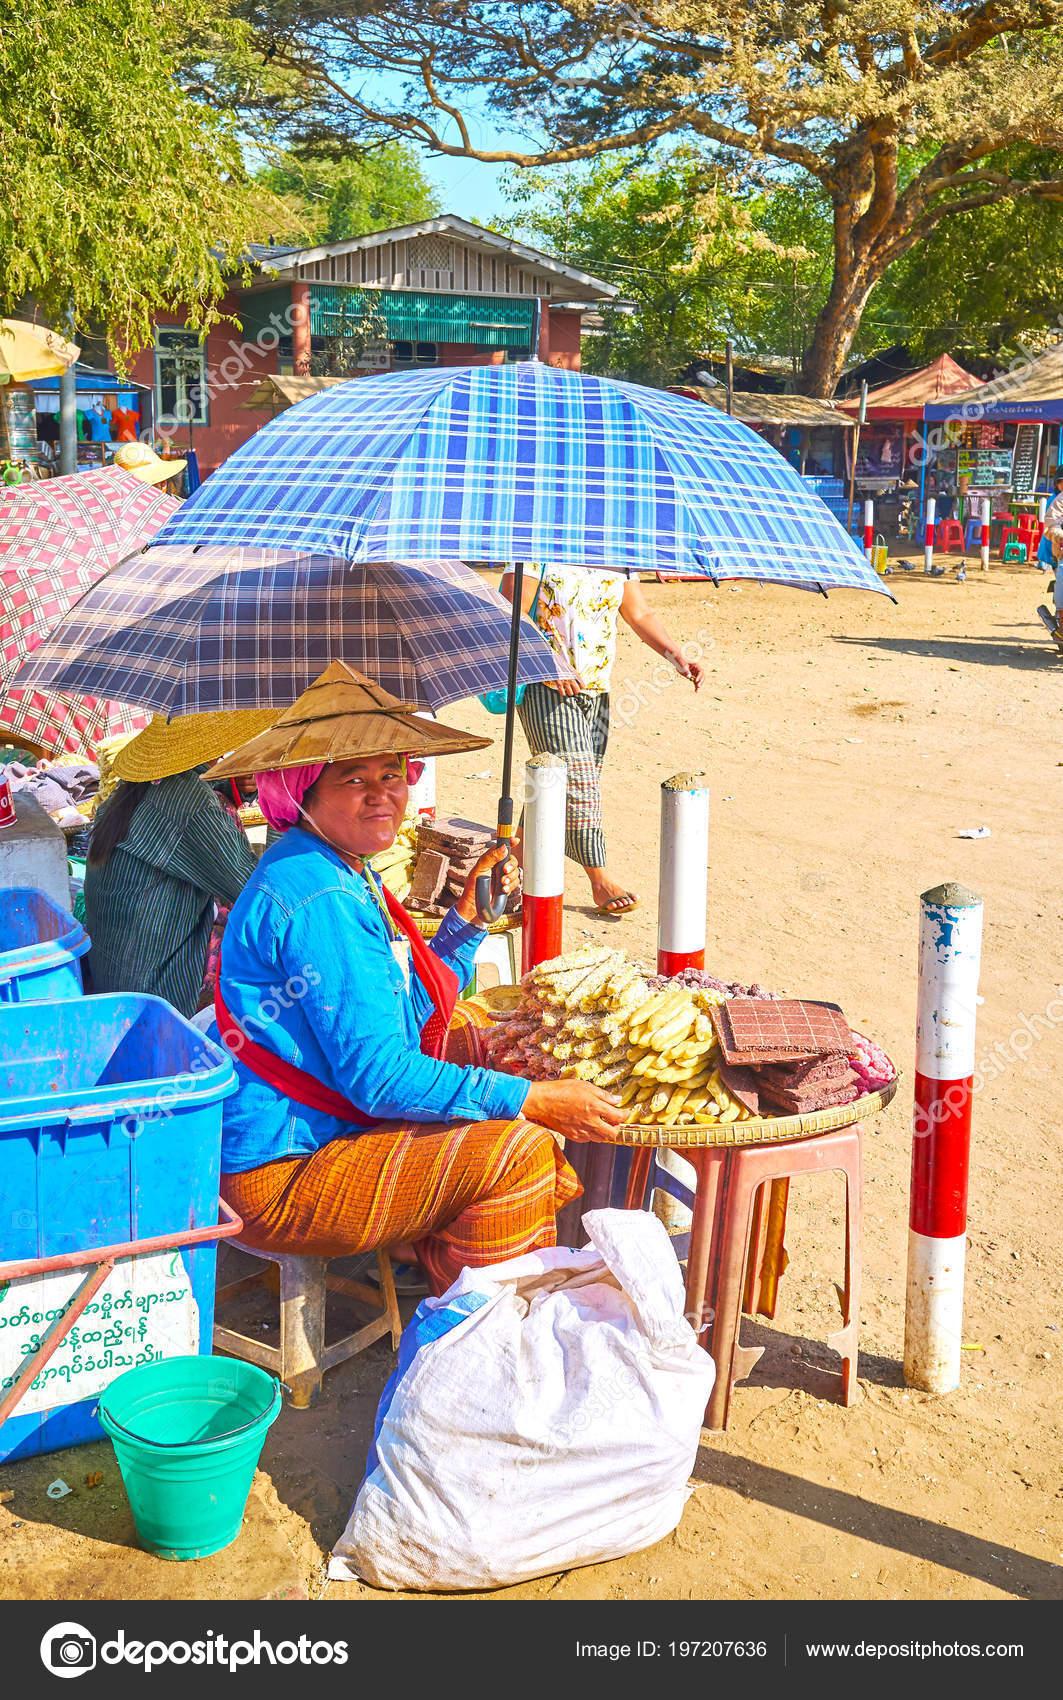 Bagan Myanmar February 2018 Smilimg Merchant Sells Sweets